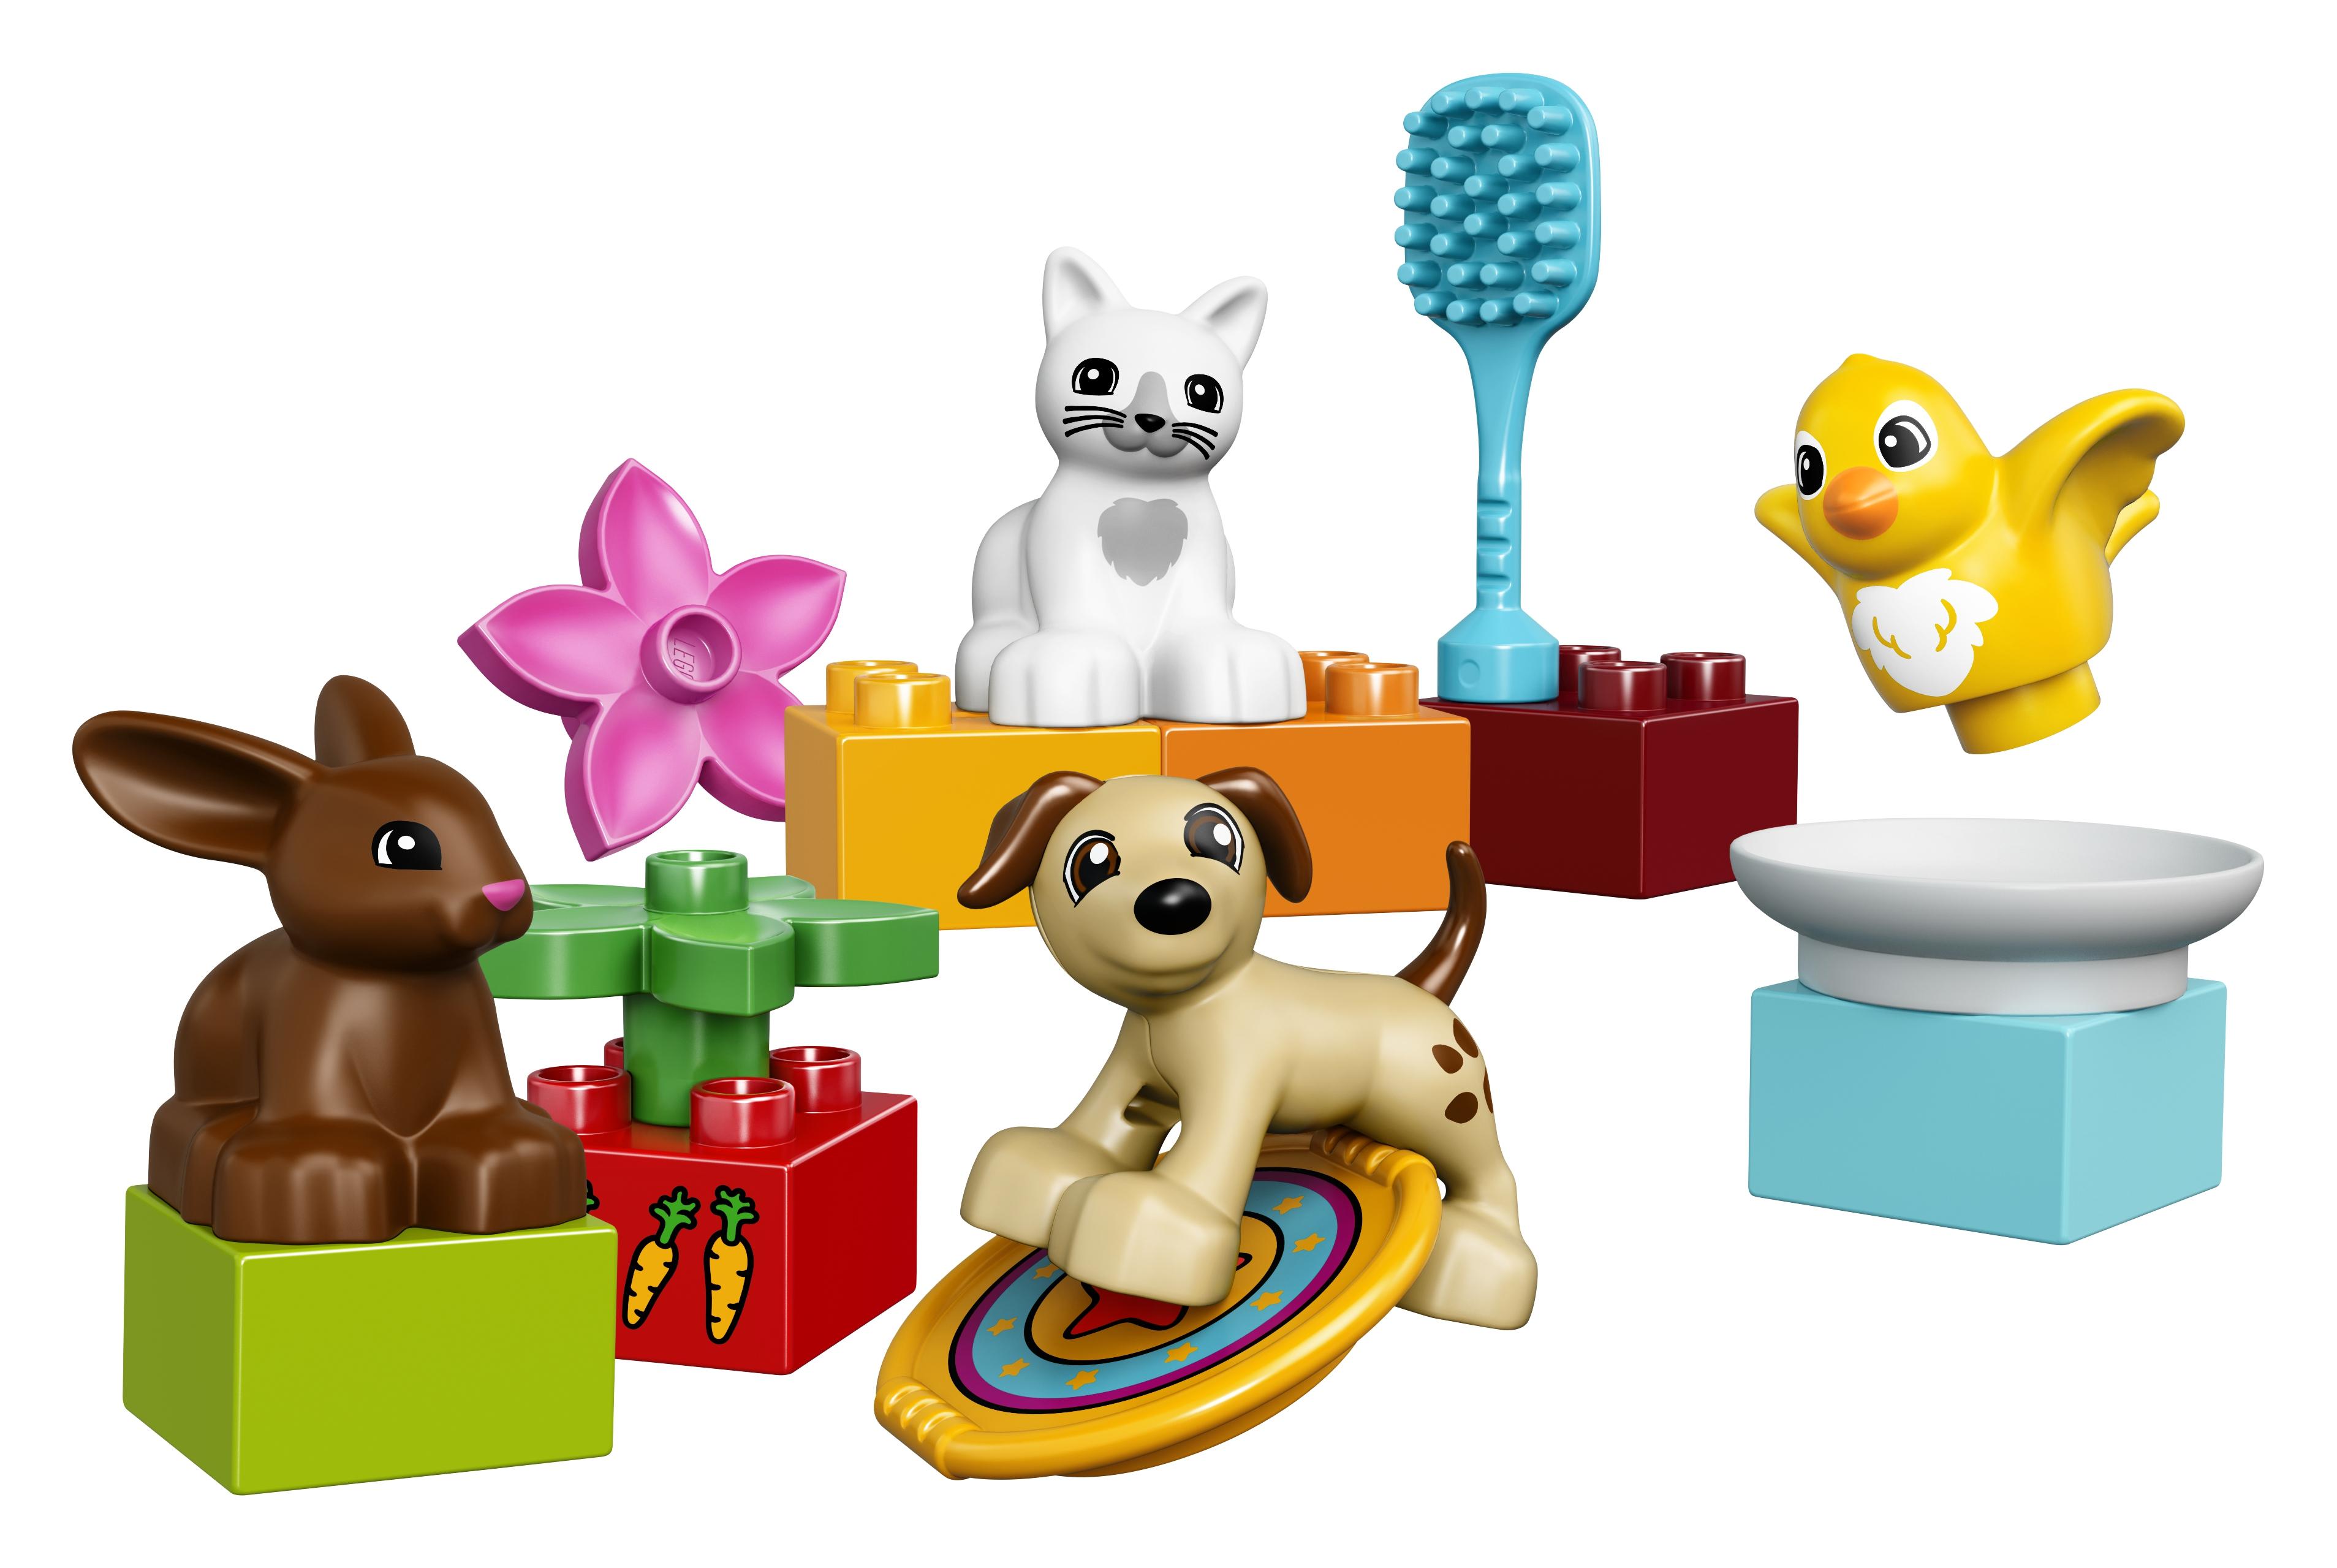 LEGO DUPLO LEGO Duplo Town 10838 Домашние животные